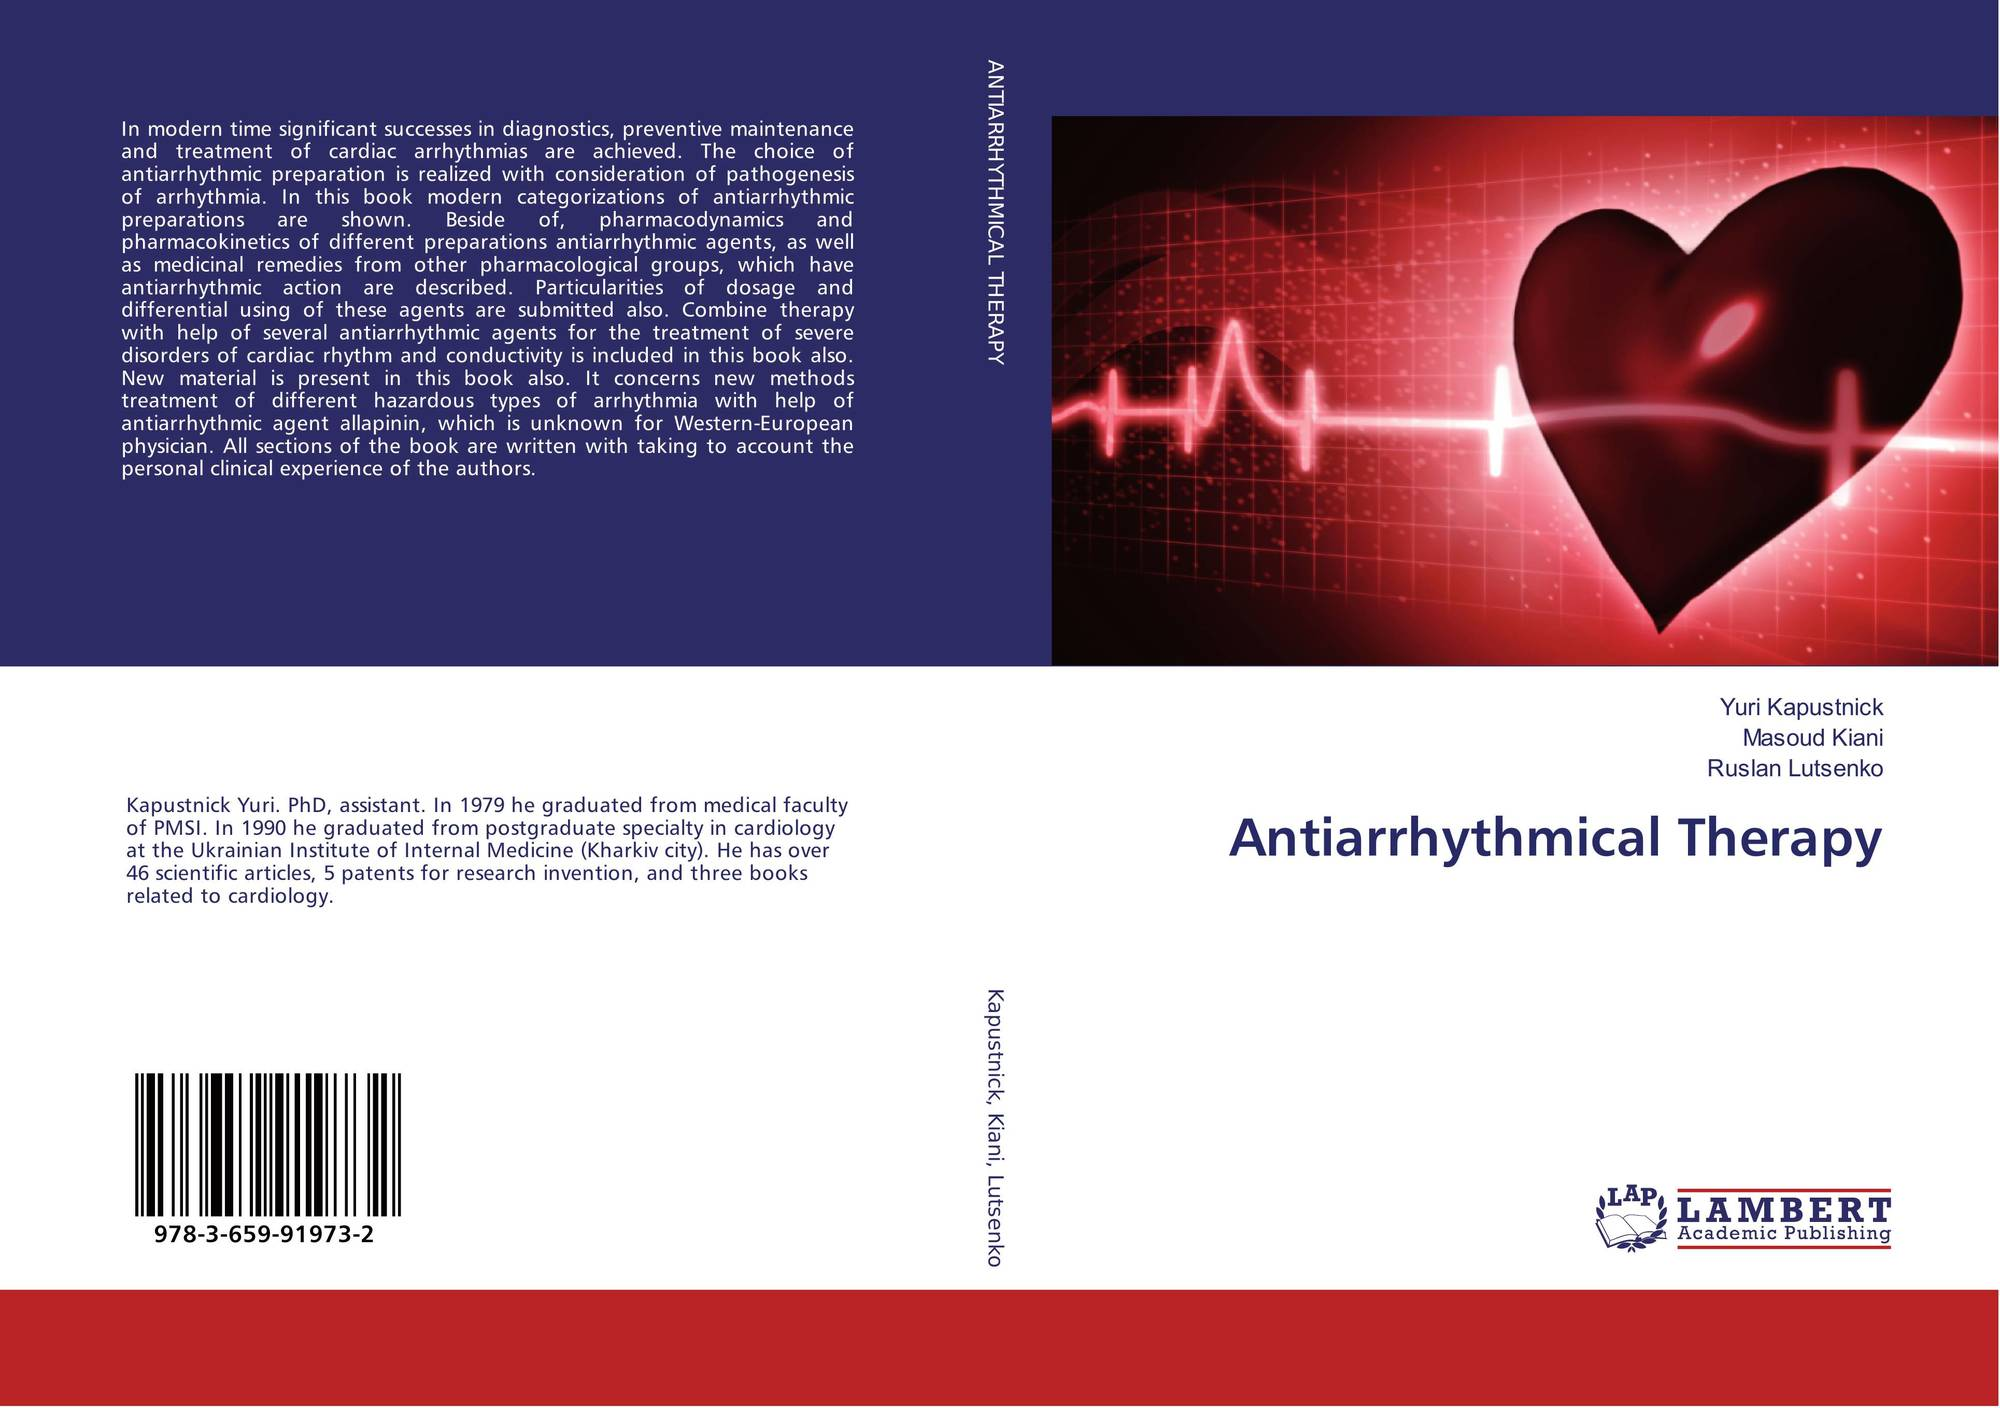 LAP LAMBERT Academic Publishing - 151004 Products | Page 3239 |